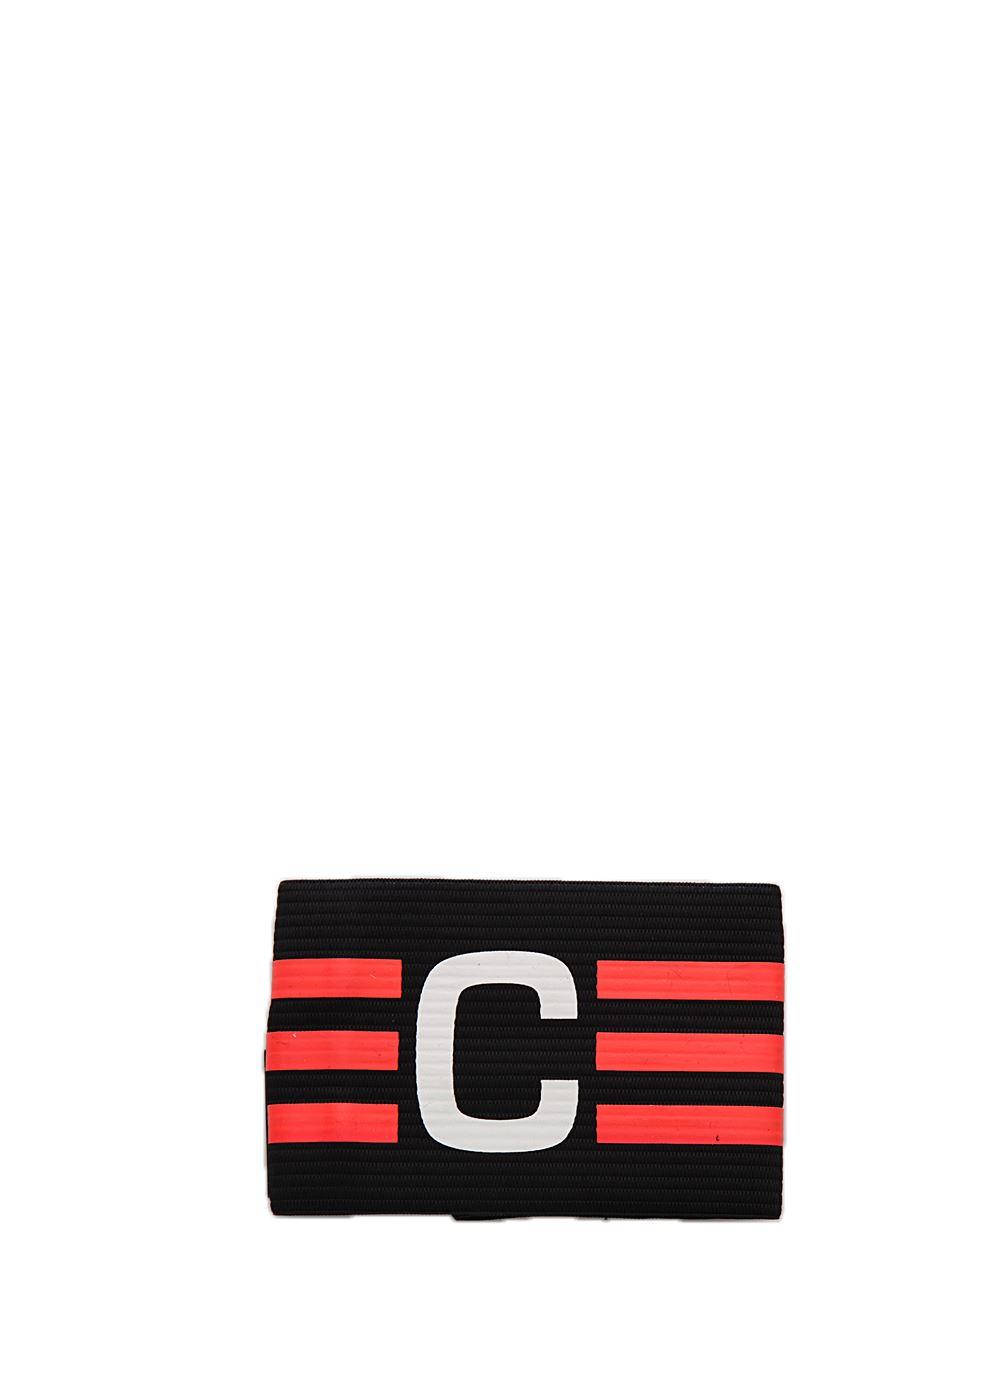 Sports Collection - Περικάρπιο Adidas FW